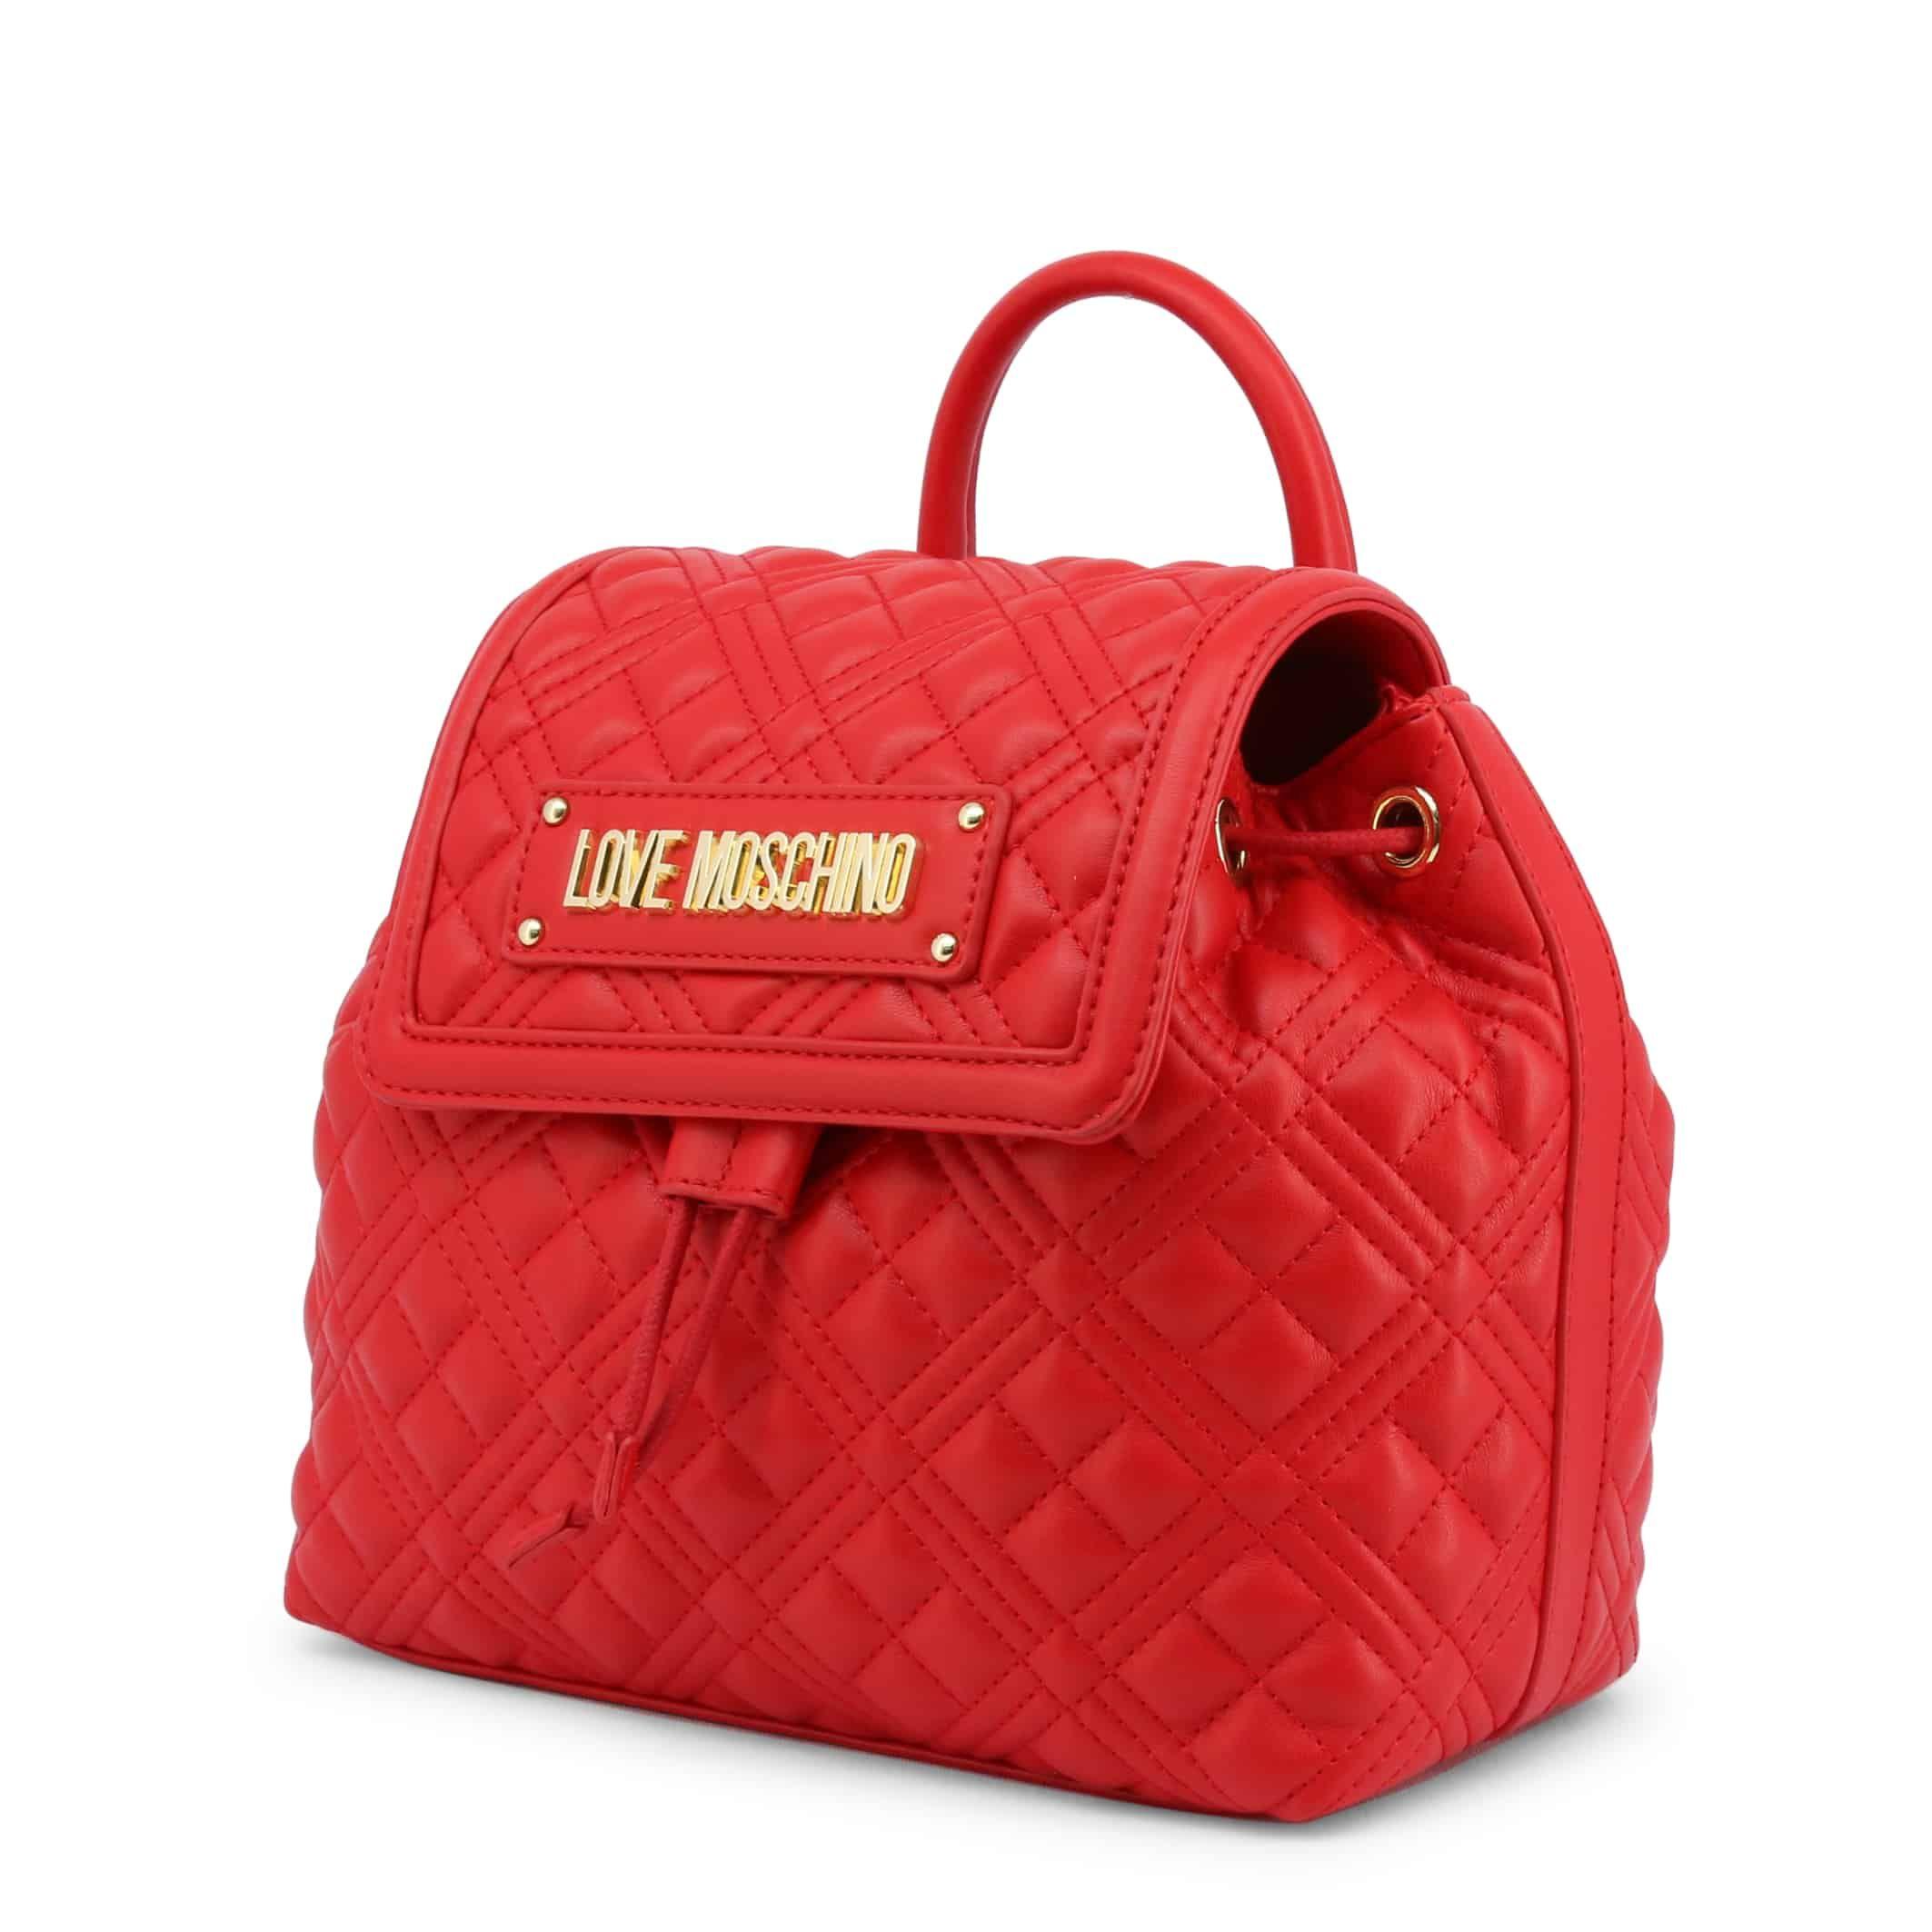 9Ef0B690 8B42 11Eb Abbe 756064413543 Love Moschino - Jc4009Pp1Cla0 - Red